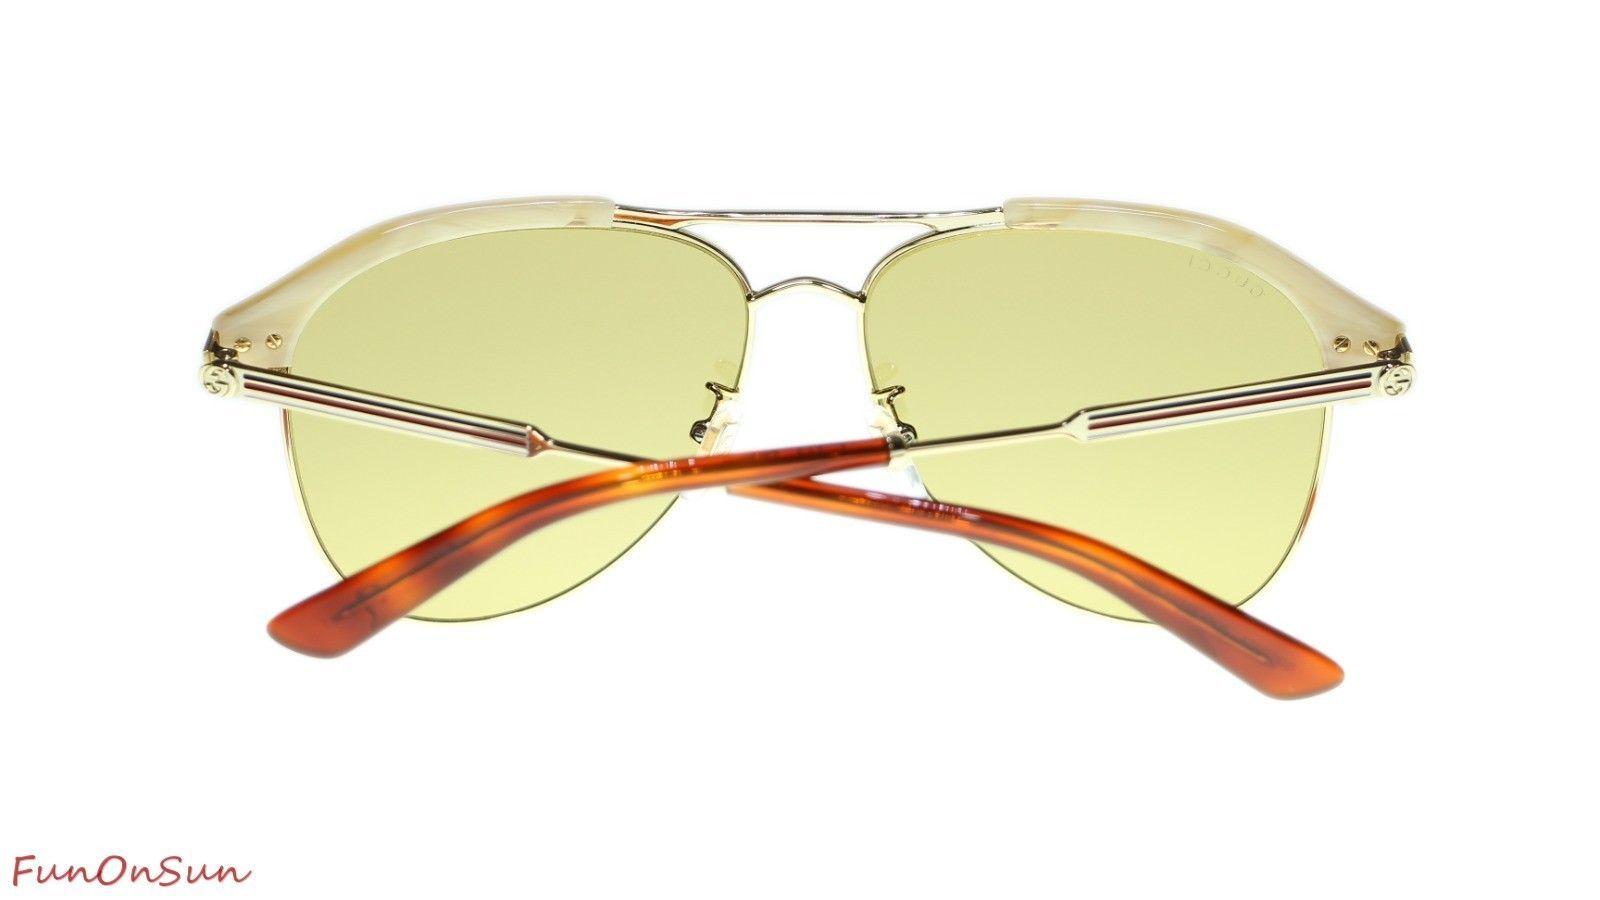 c5494e5a8482d Gucci Men Sunglasses GG0288SA 004 Beige Gold Brown Lens Aviator 60mm  Authentic